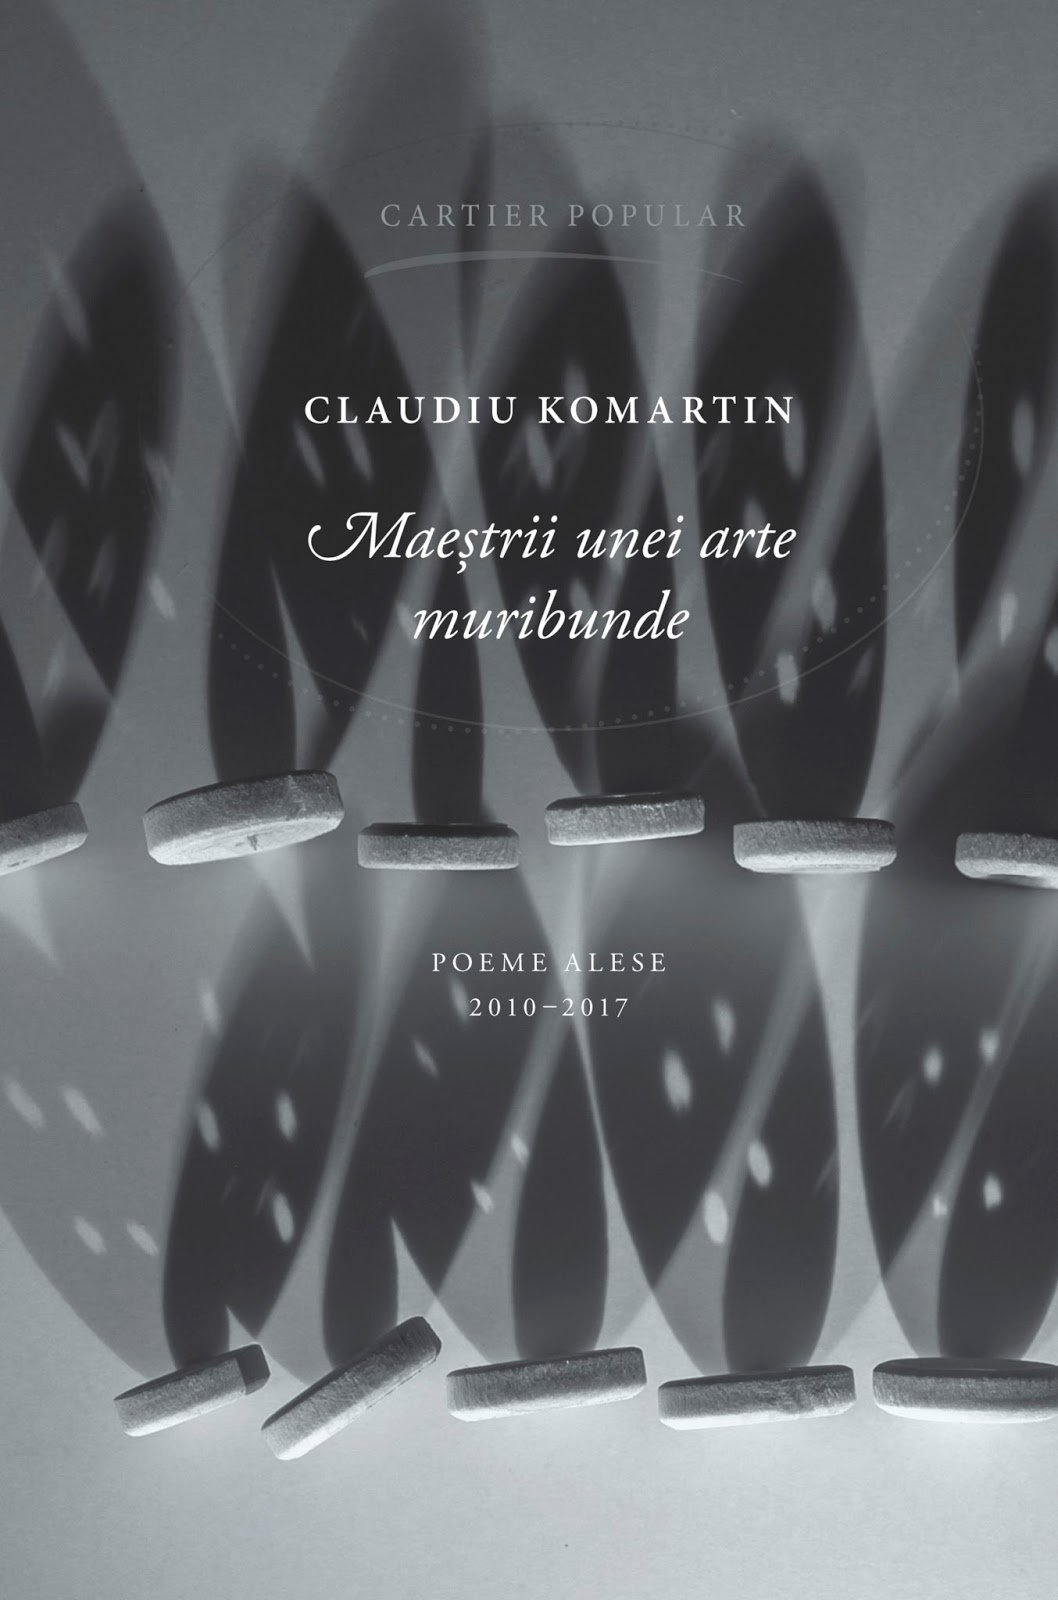 https://revista22.ro/files/news/manset/default/carte-ciurtin-2-1465.jpg